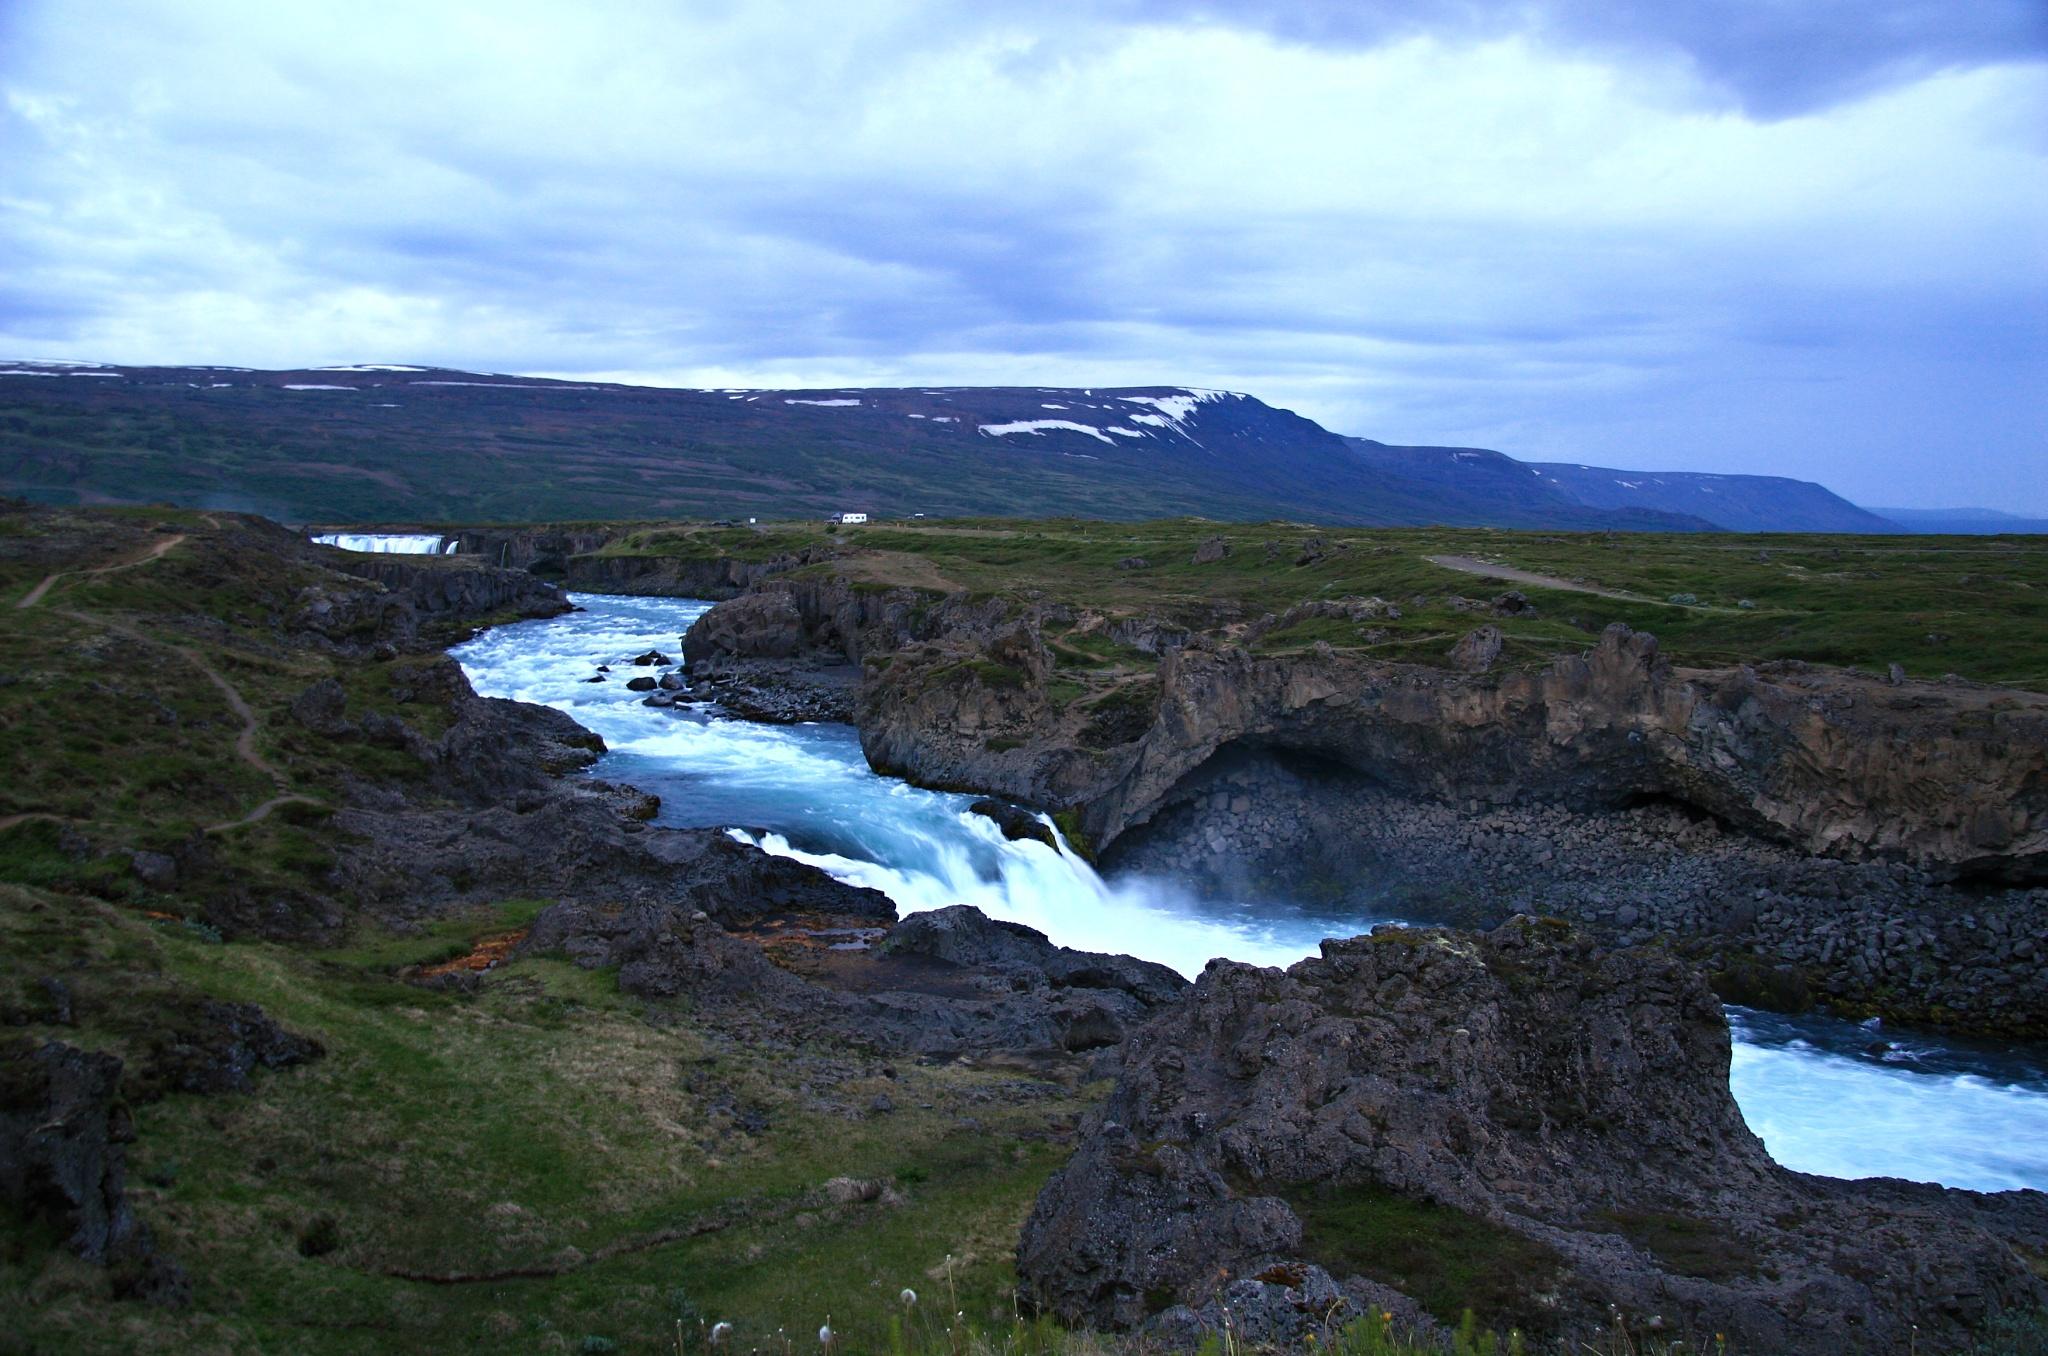 Divoká voda kousek od vodopádu Goðafoss